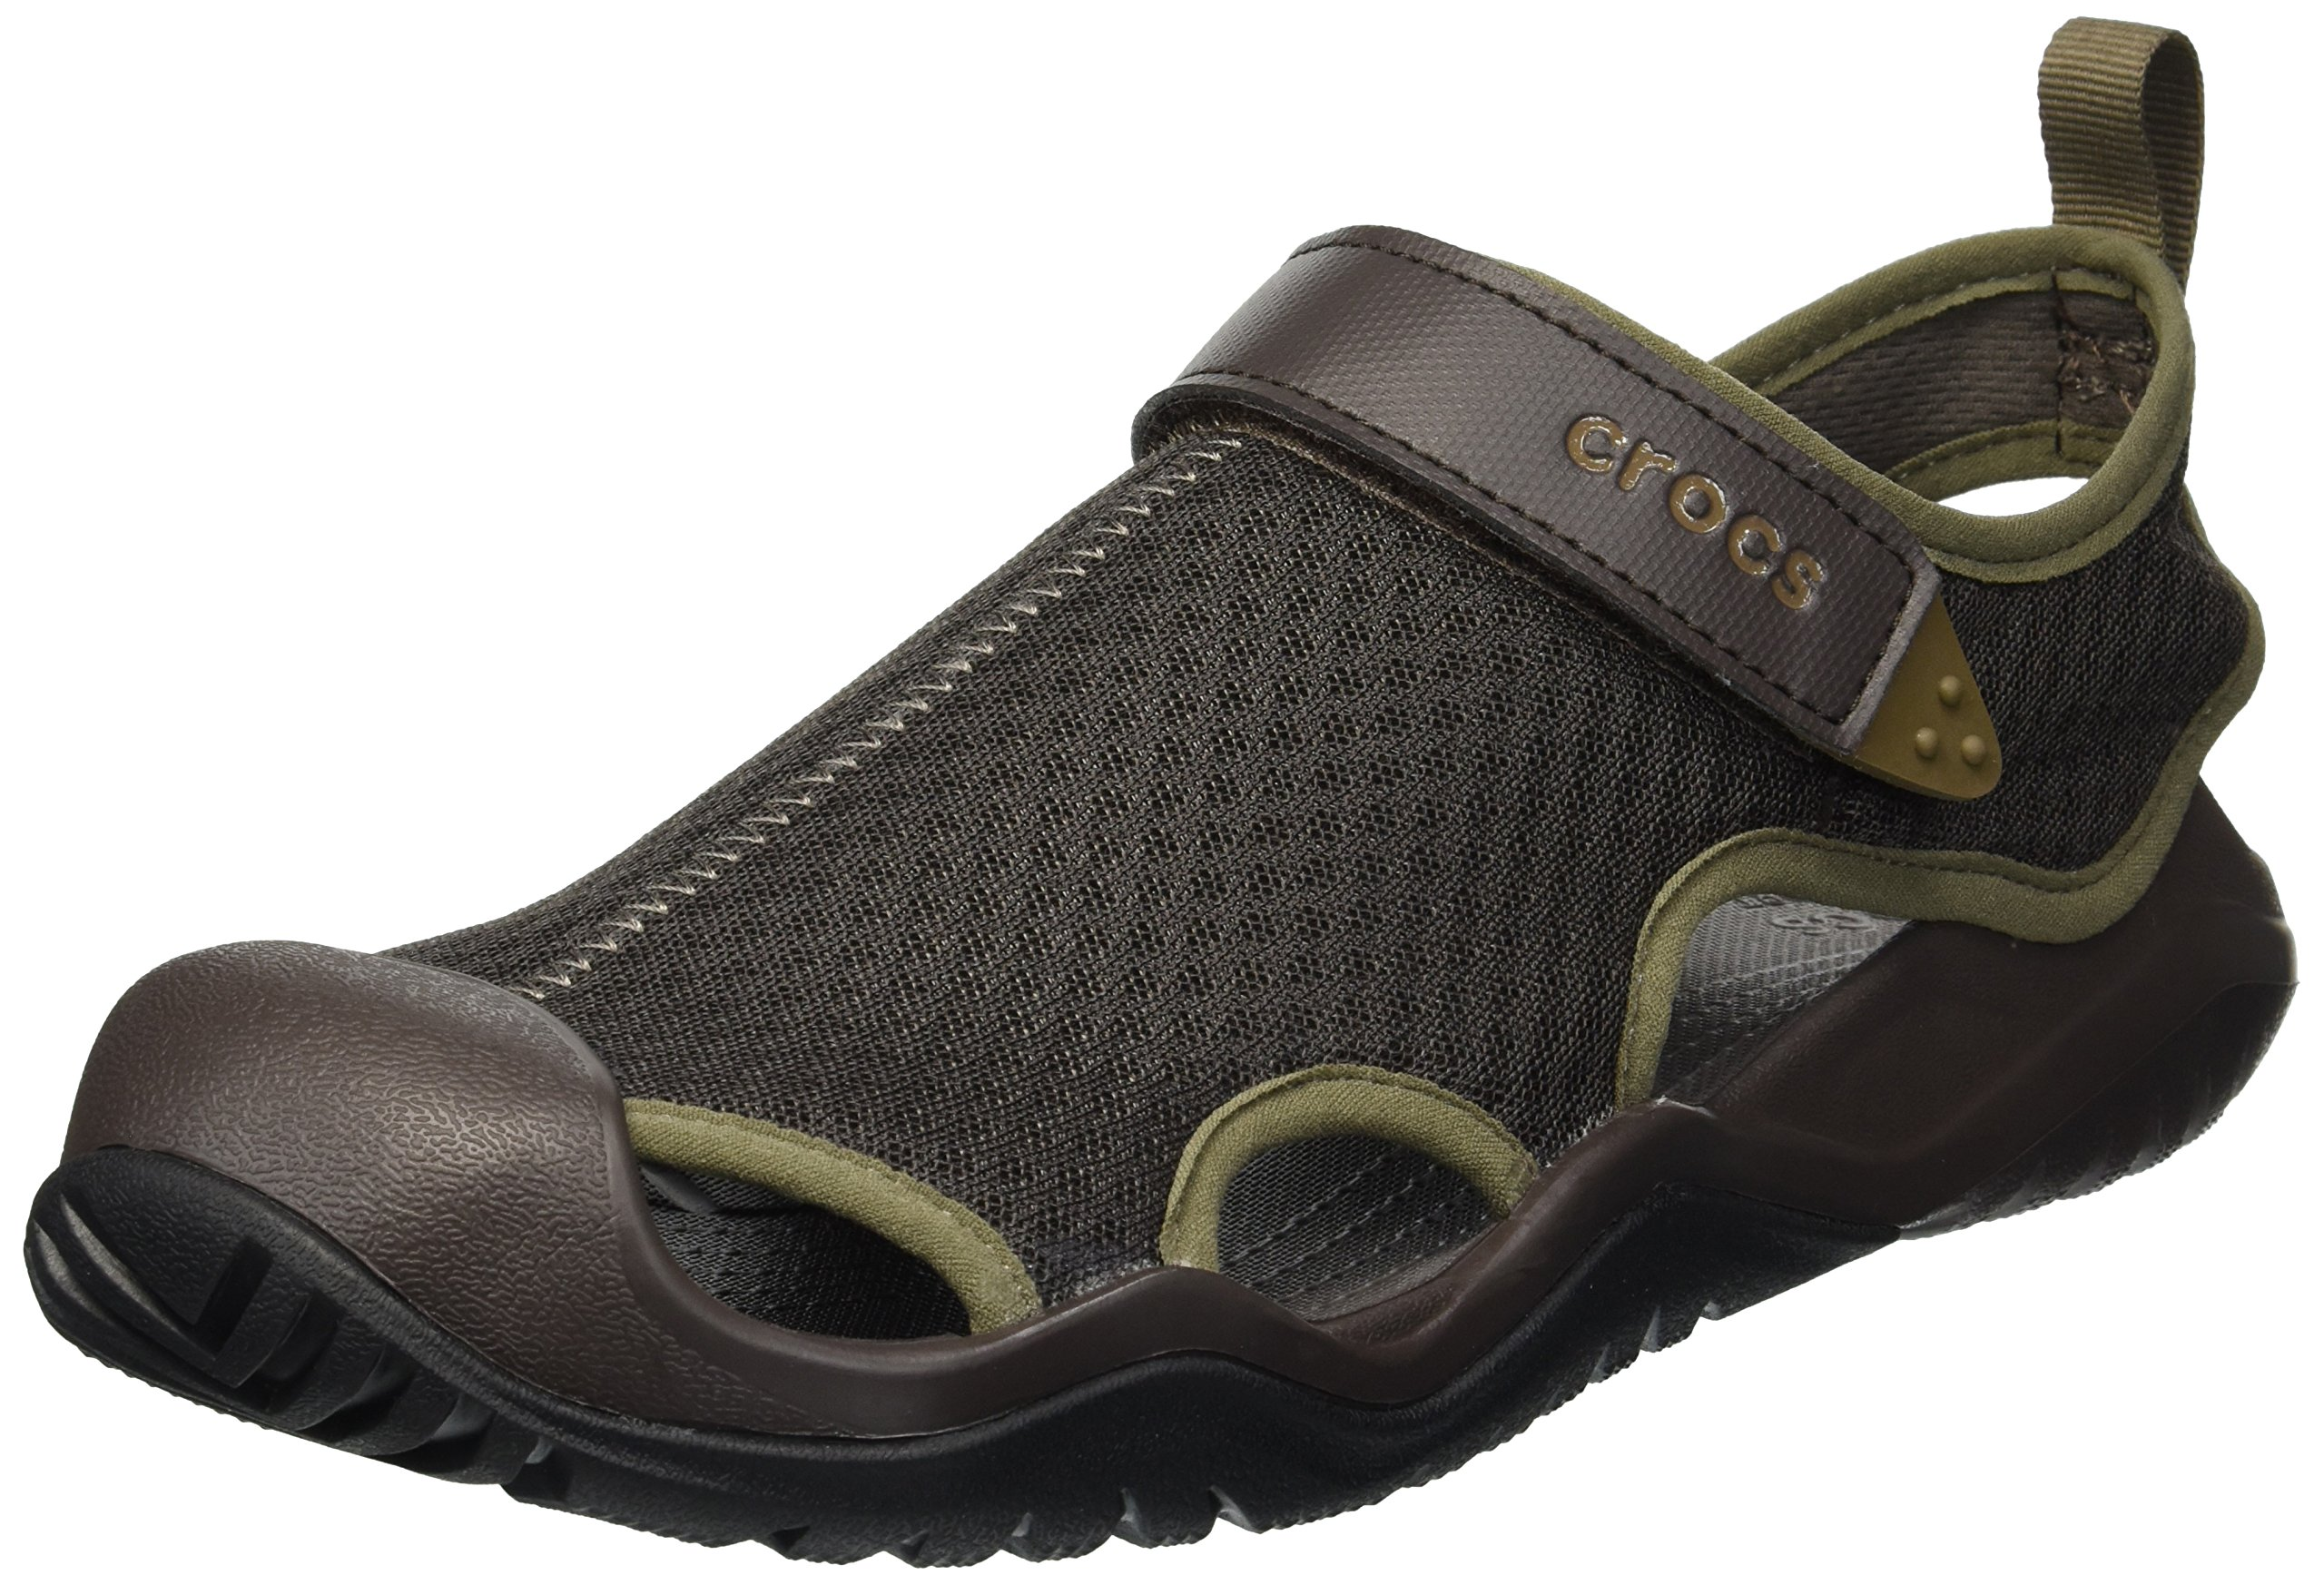 Crocs Men's Swiftwater Mesh Deck Sandal Sport, Espresso, 14 M US